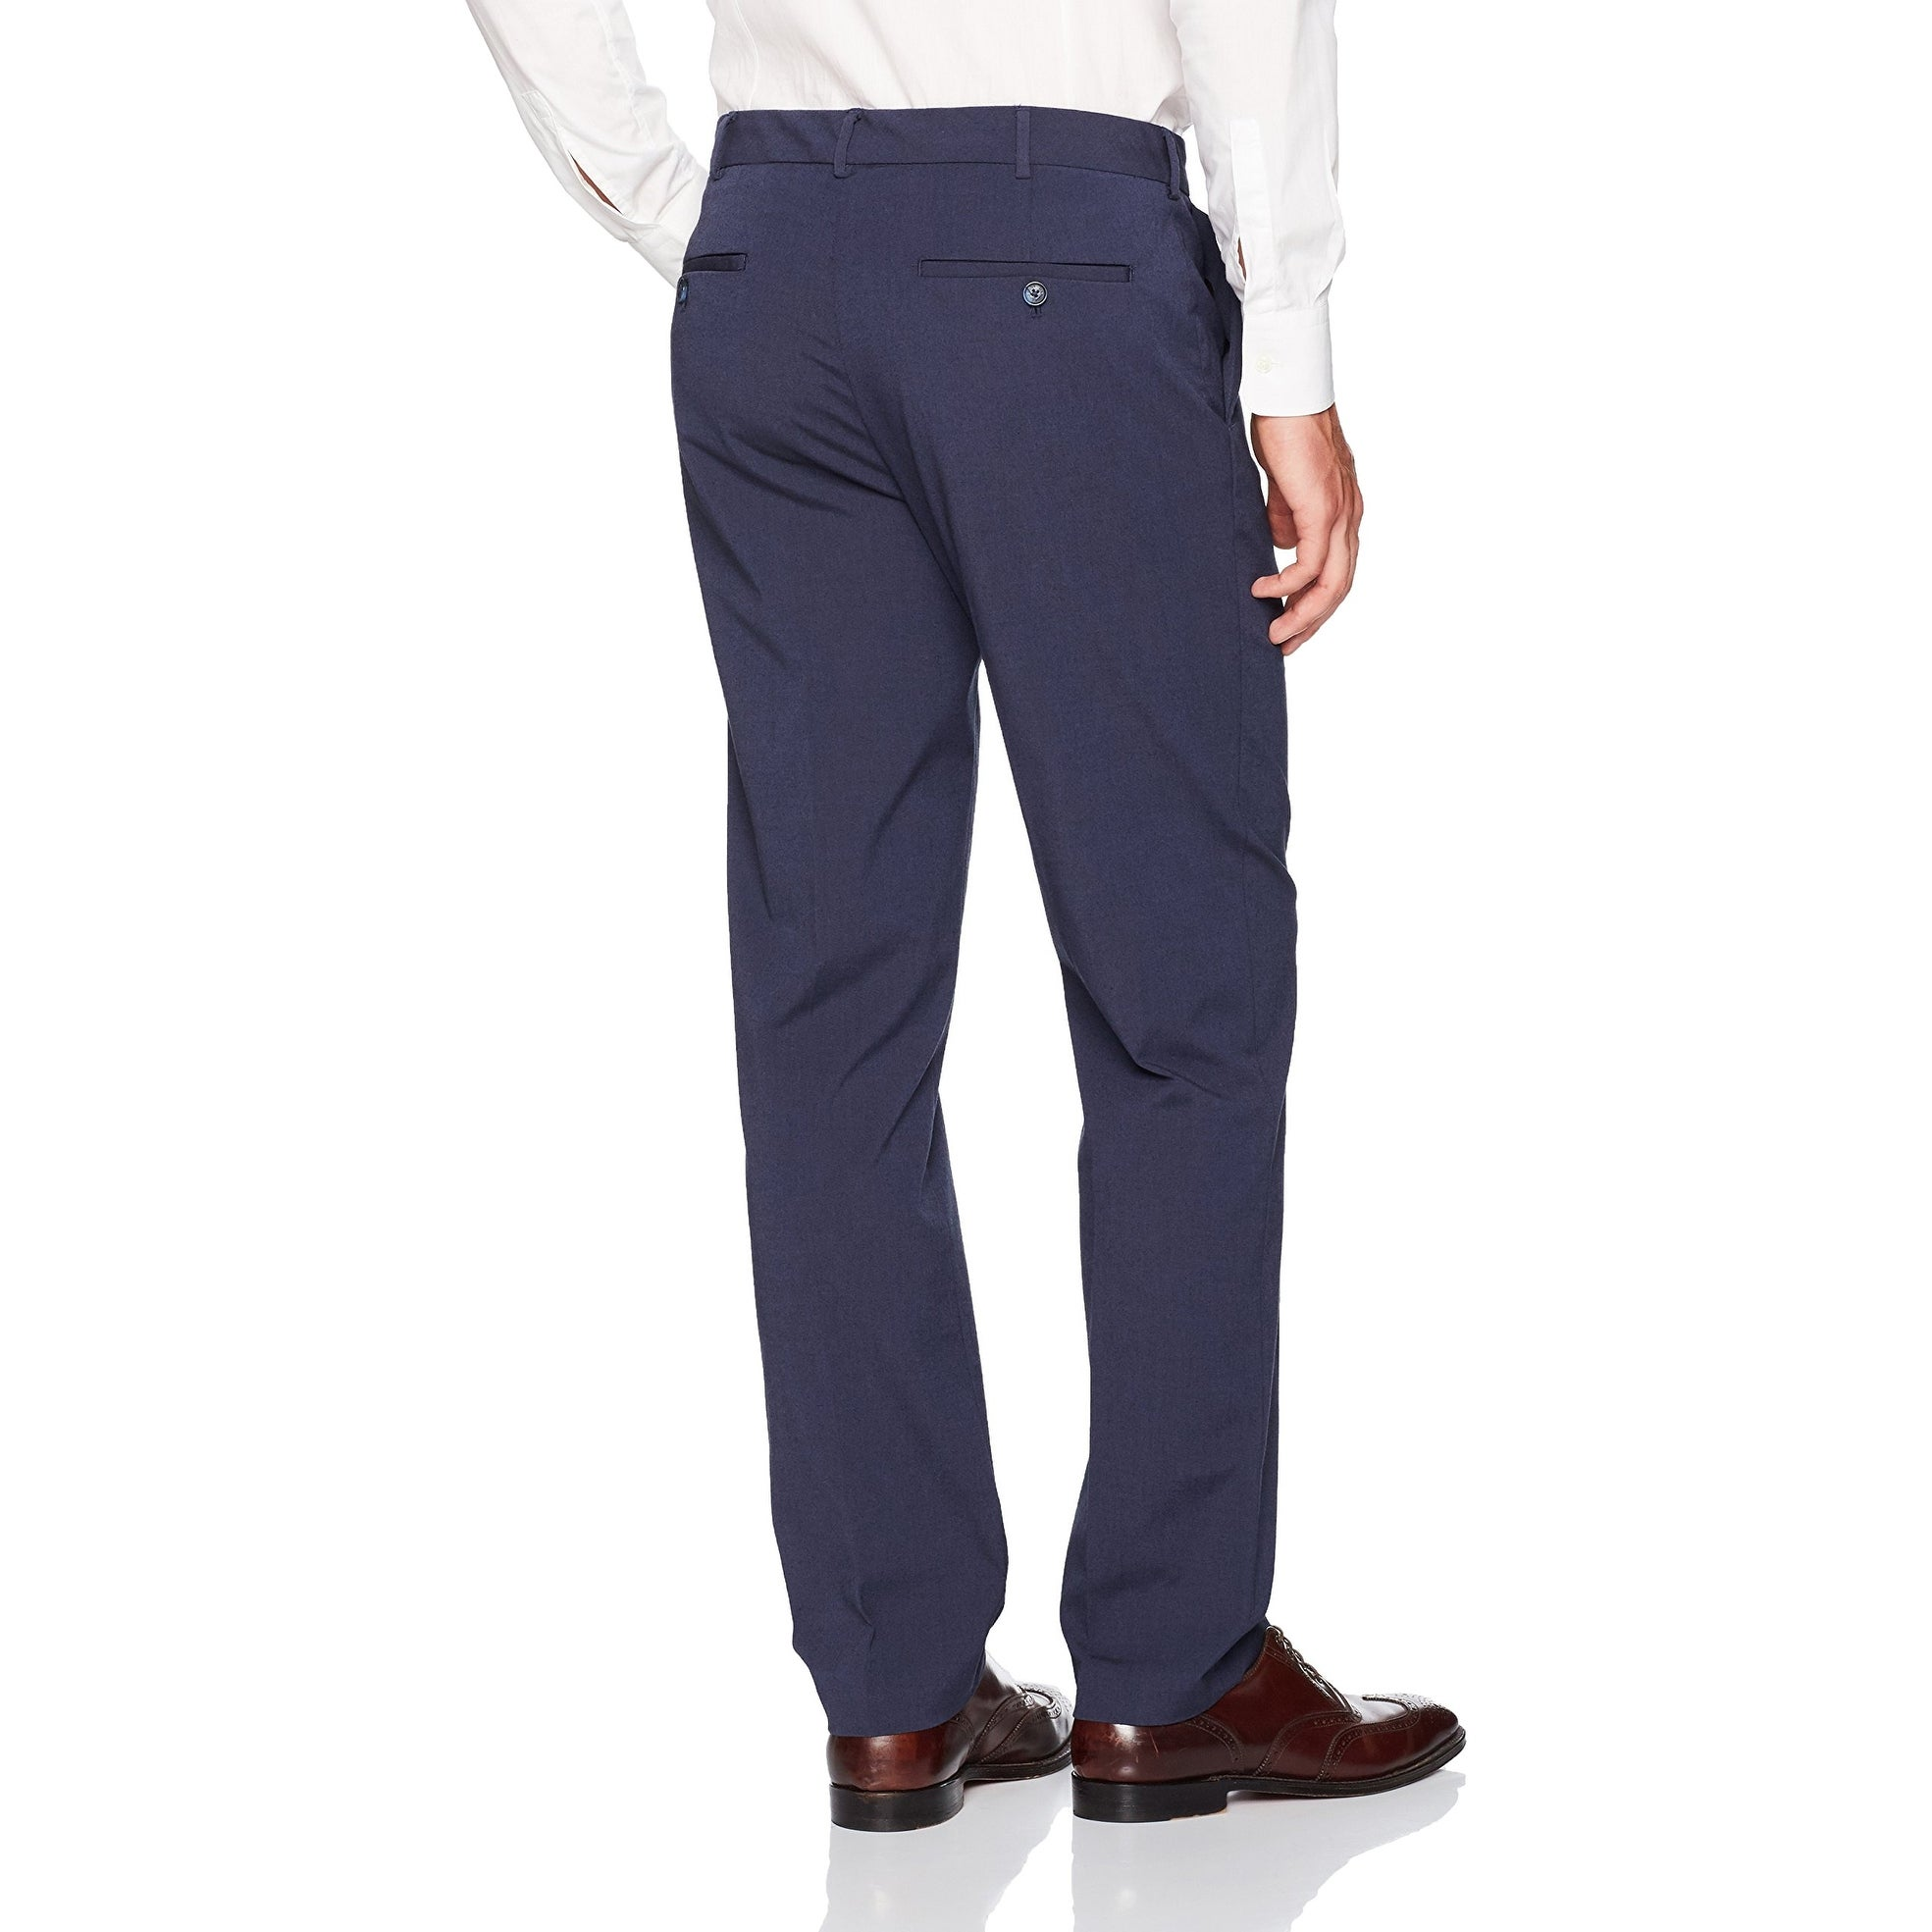 Van Heusen Mens Flex Flat Front Oxford Chino Pant